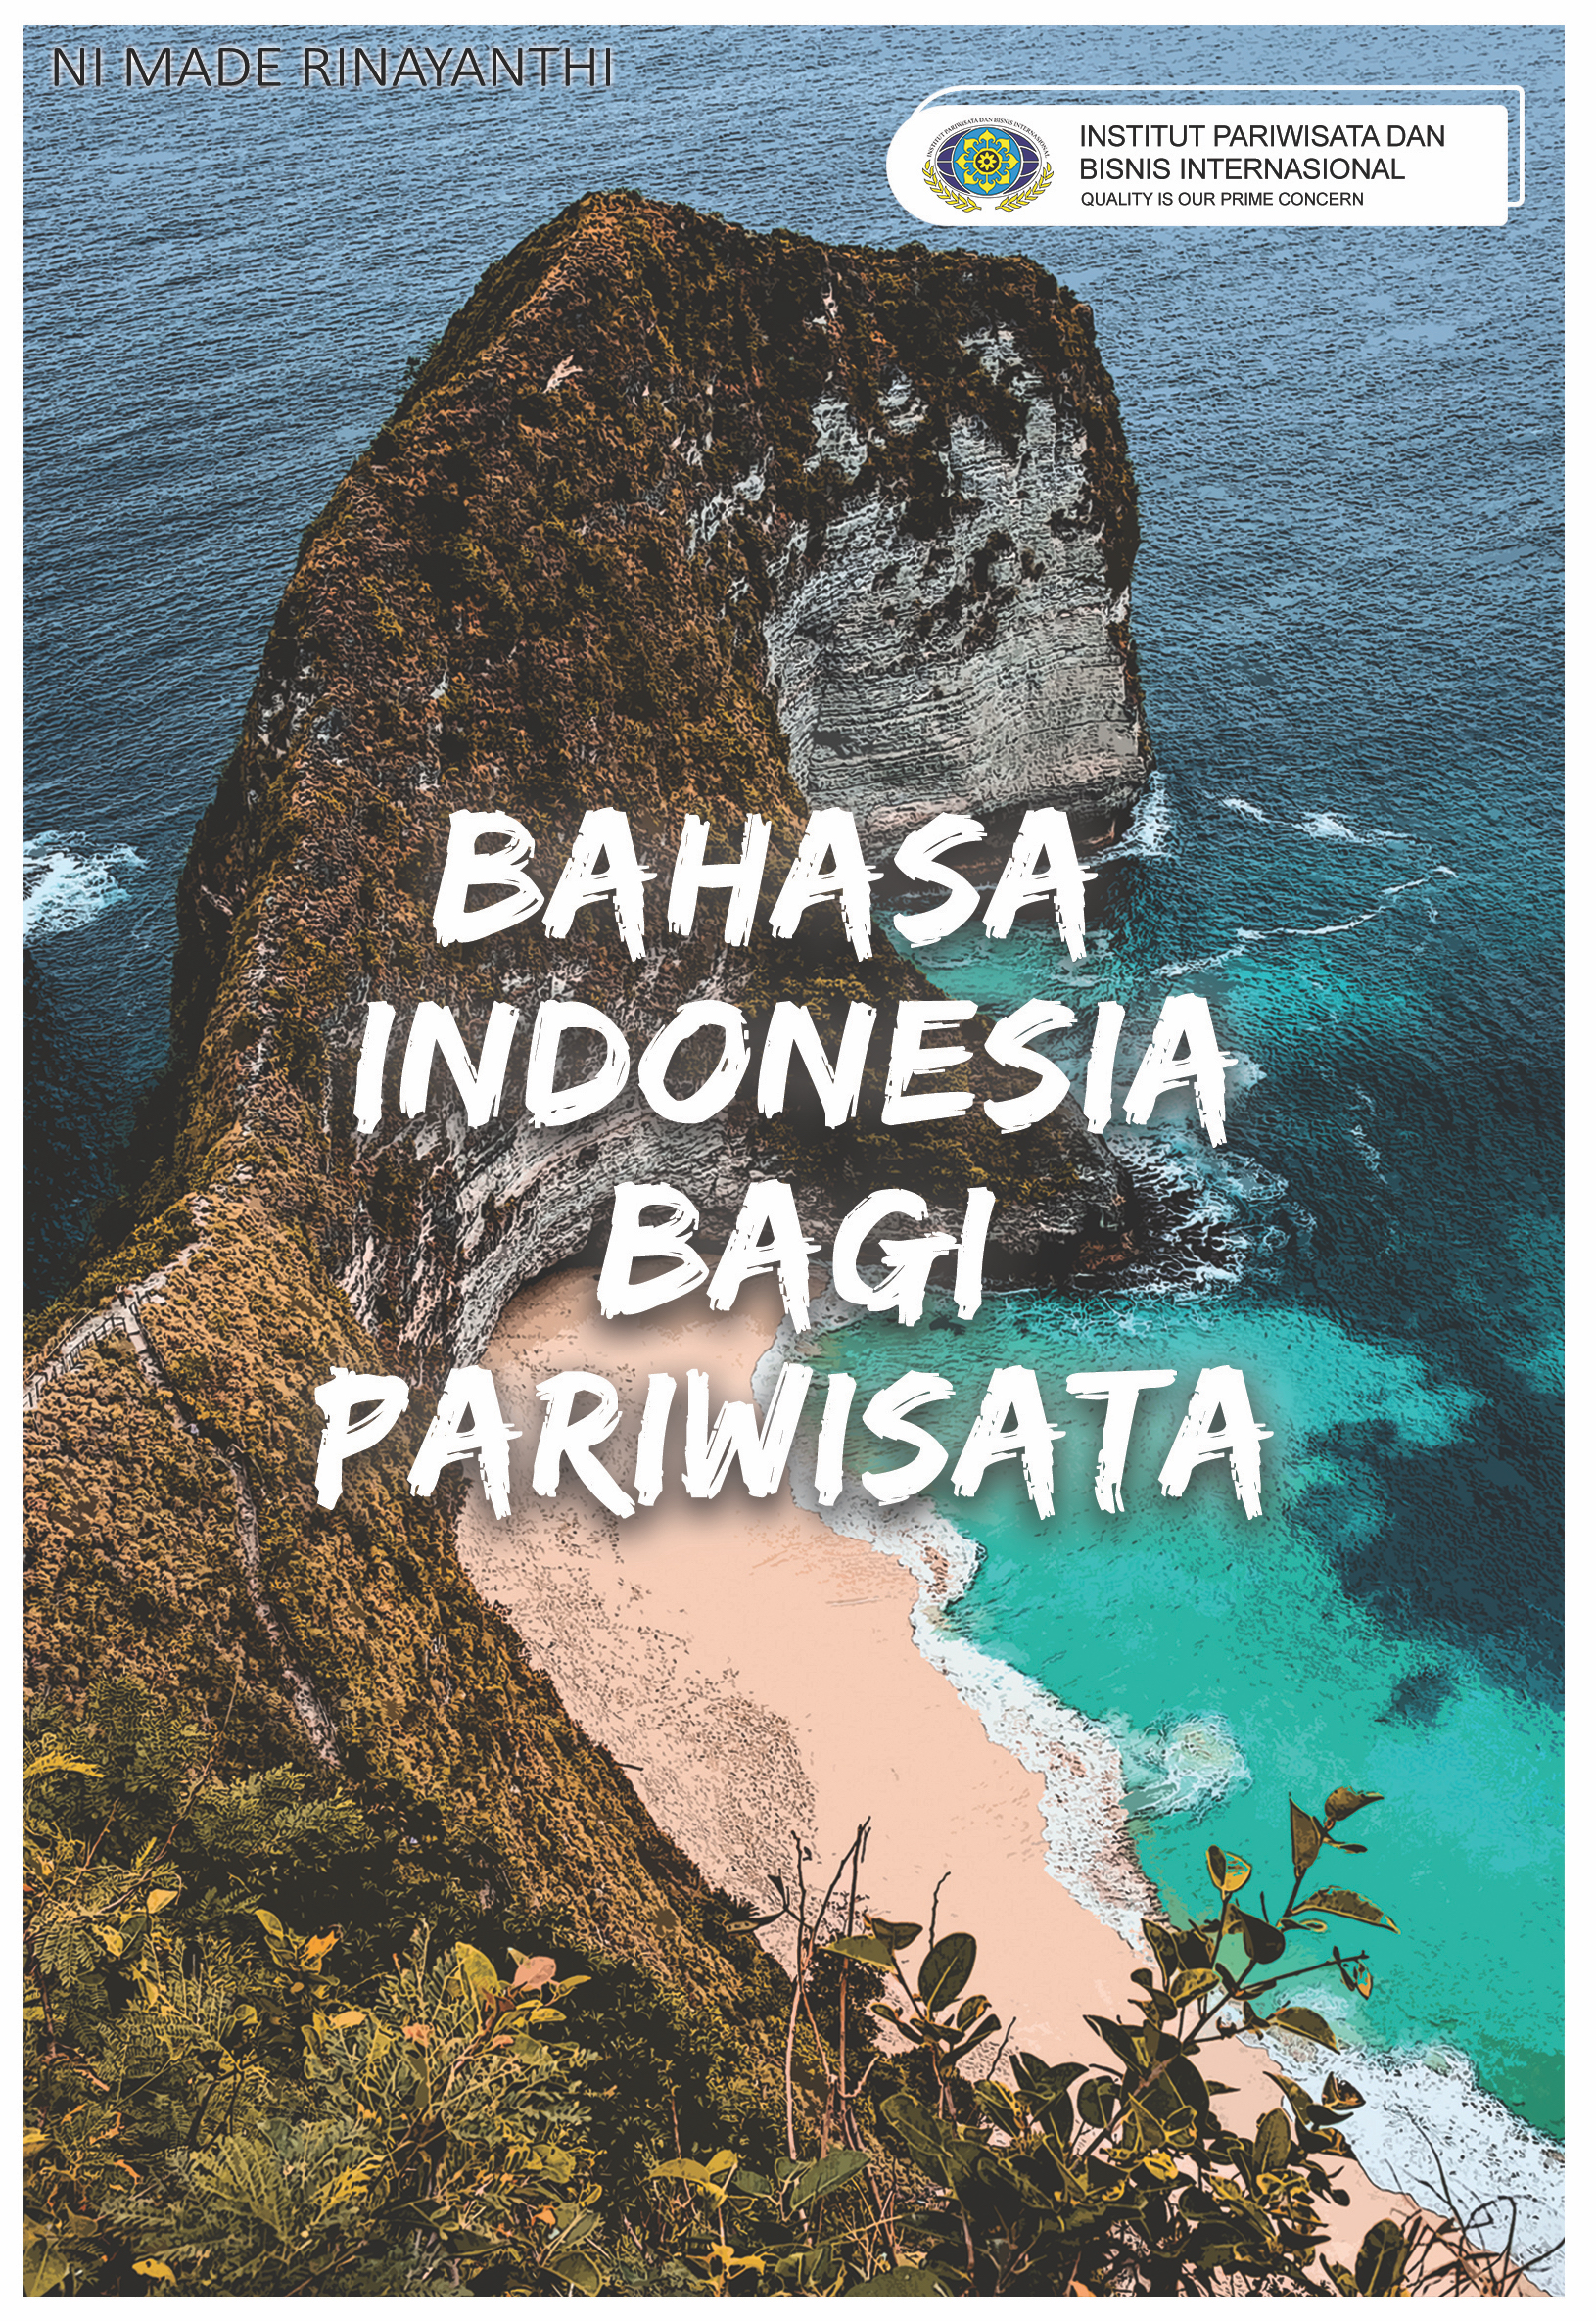 Bahasa Indonesia_SMT2_20202